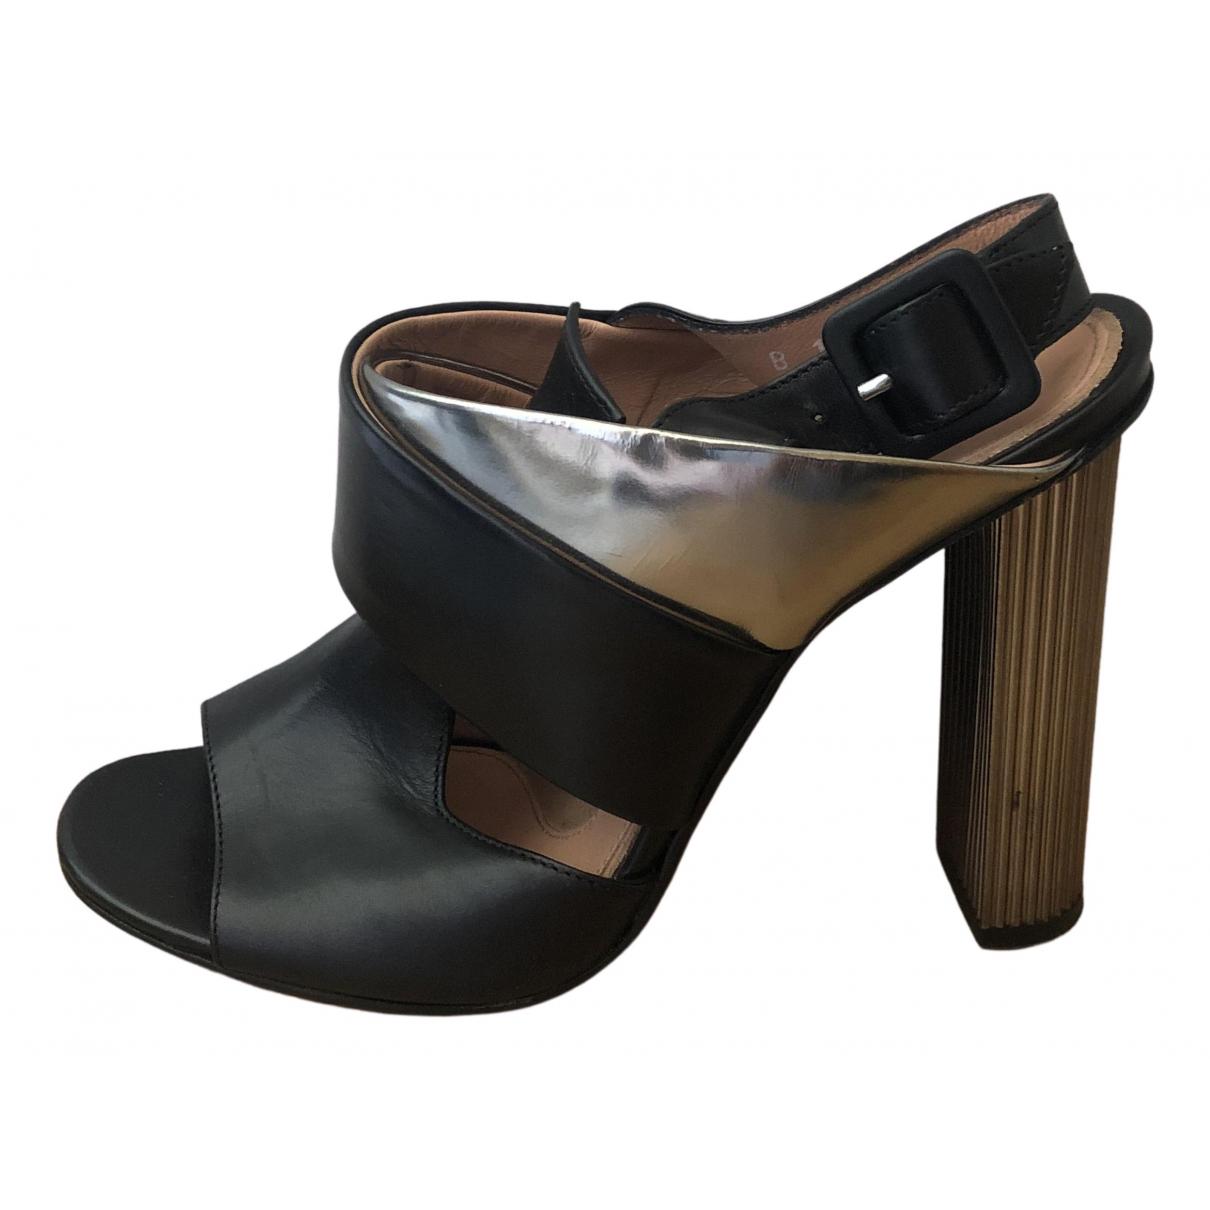 Robert Clergerie \N Black Leather Sandals for Women 39 EU